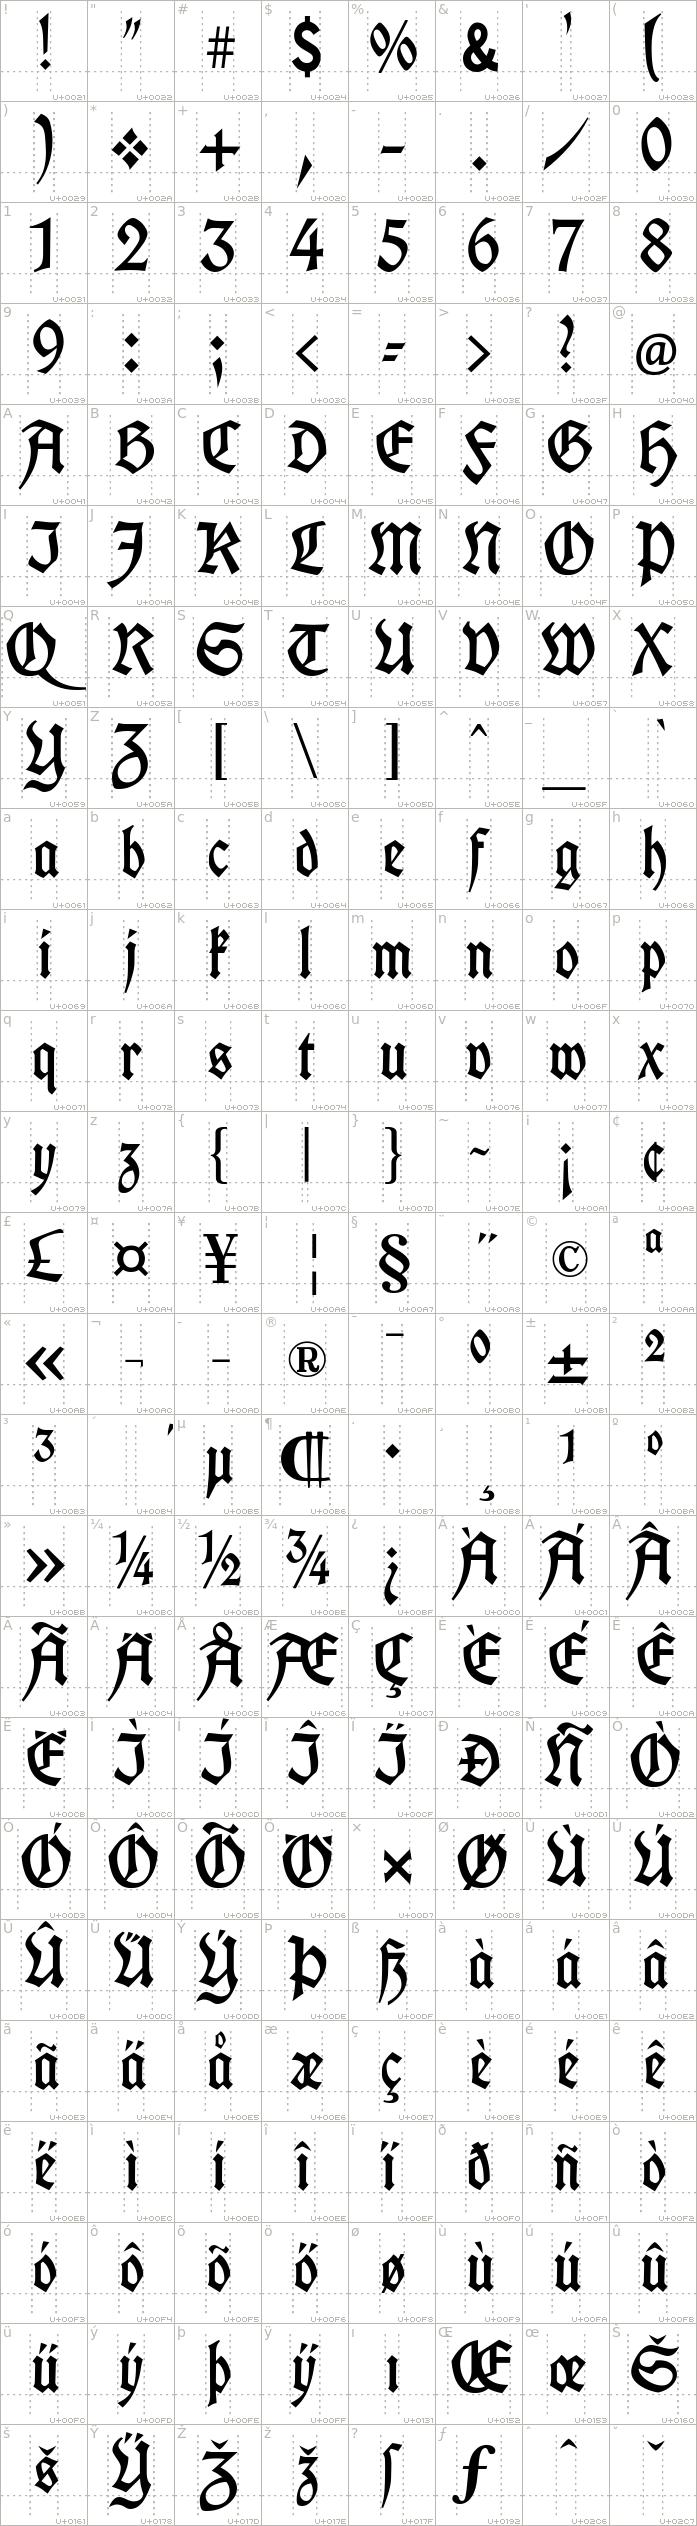 unifrakturcook.light.character-map-1